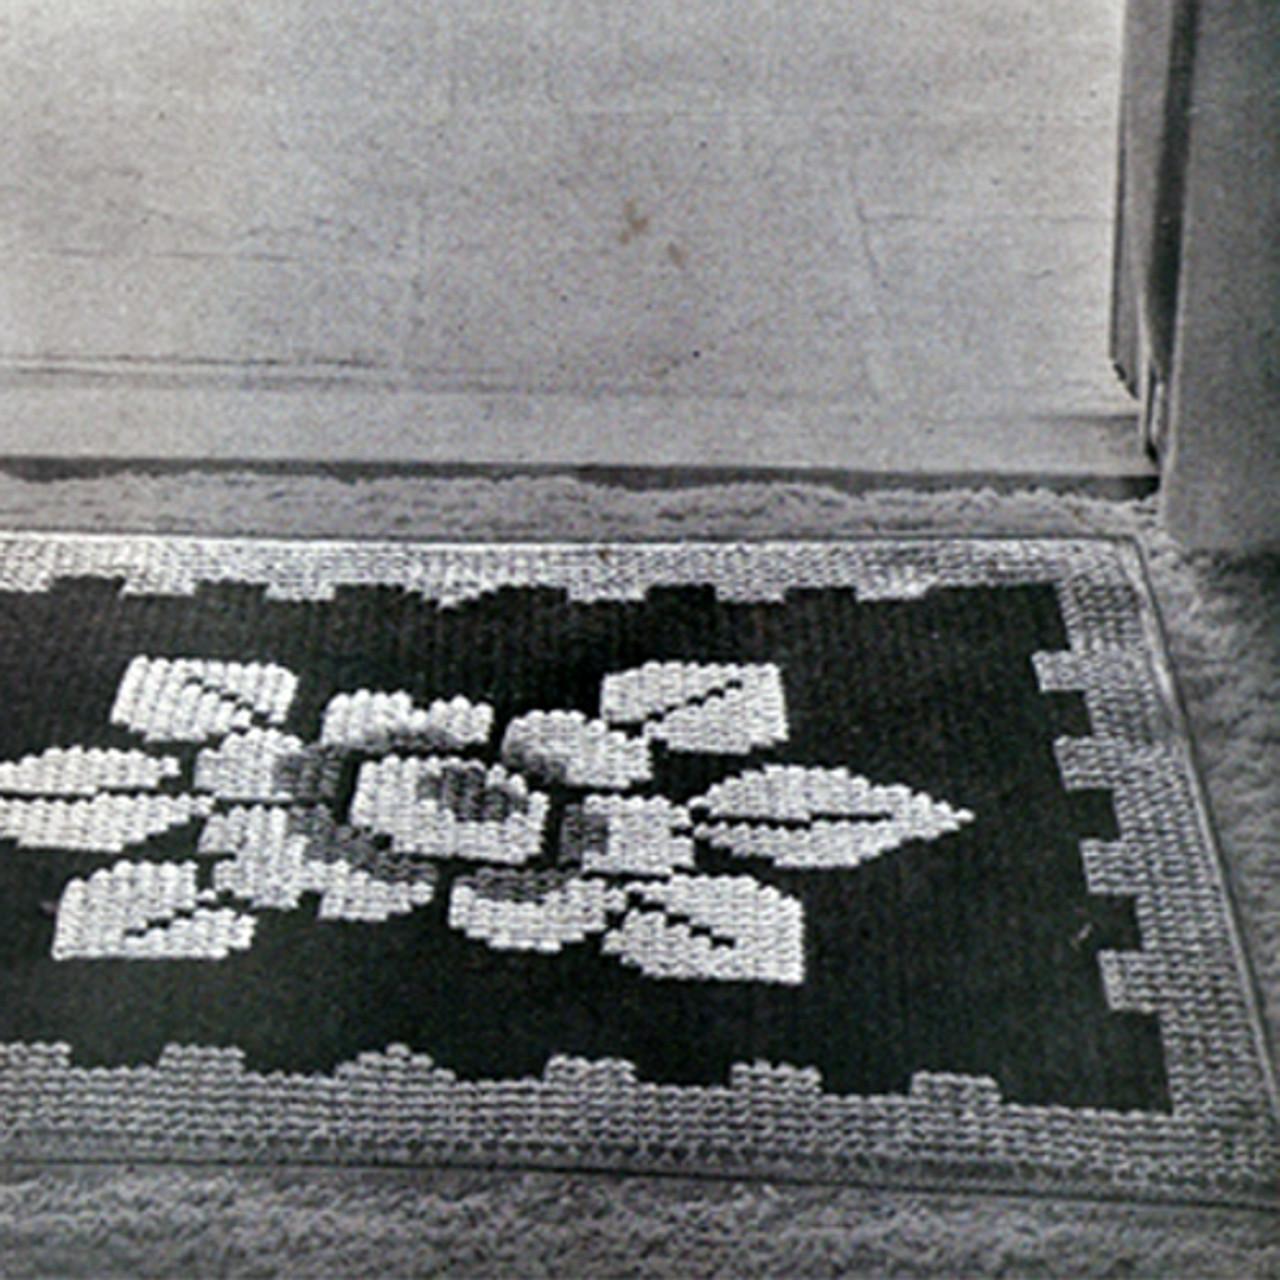 Crochet Flower Area Rug pattern, Vintage 1940s